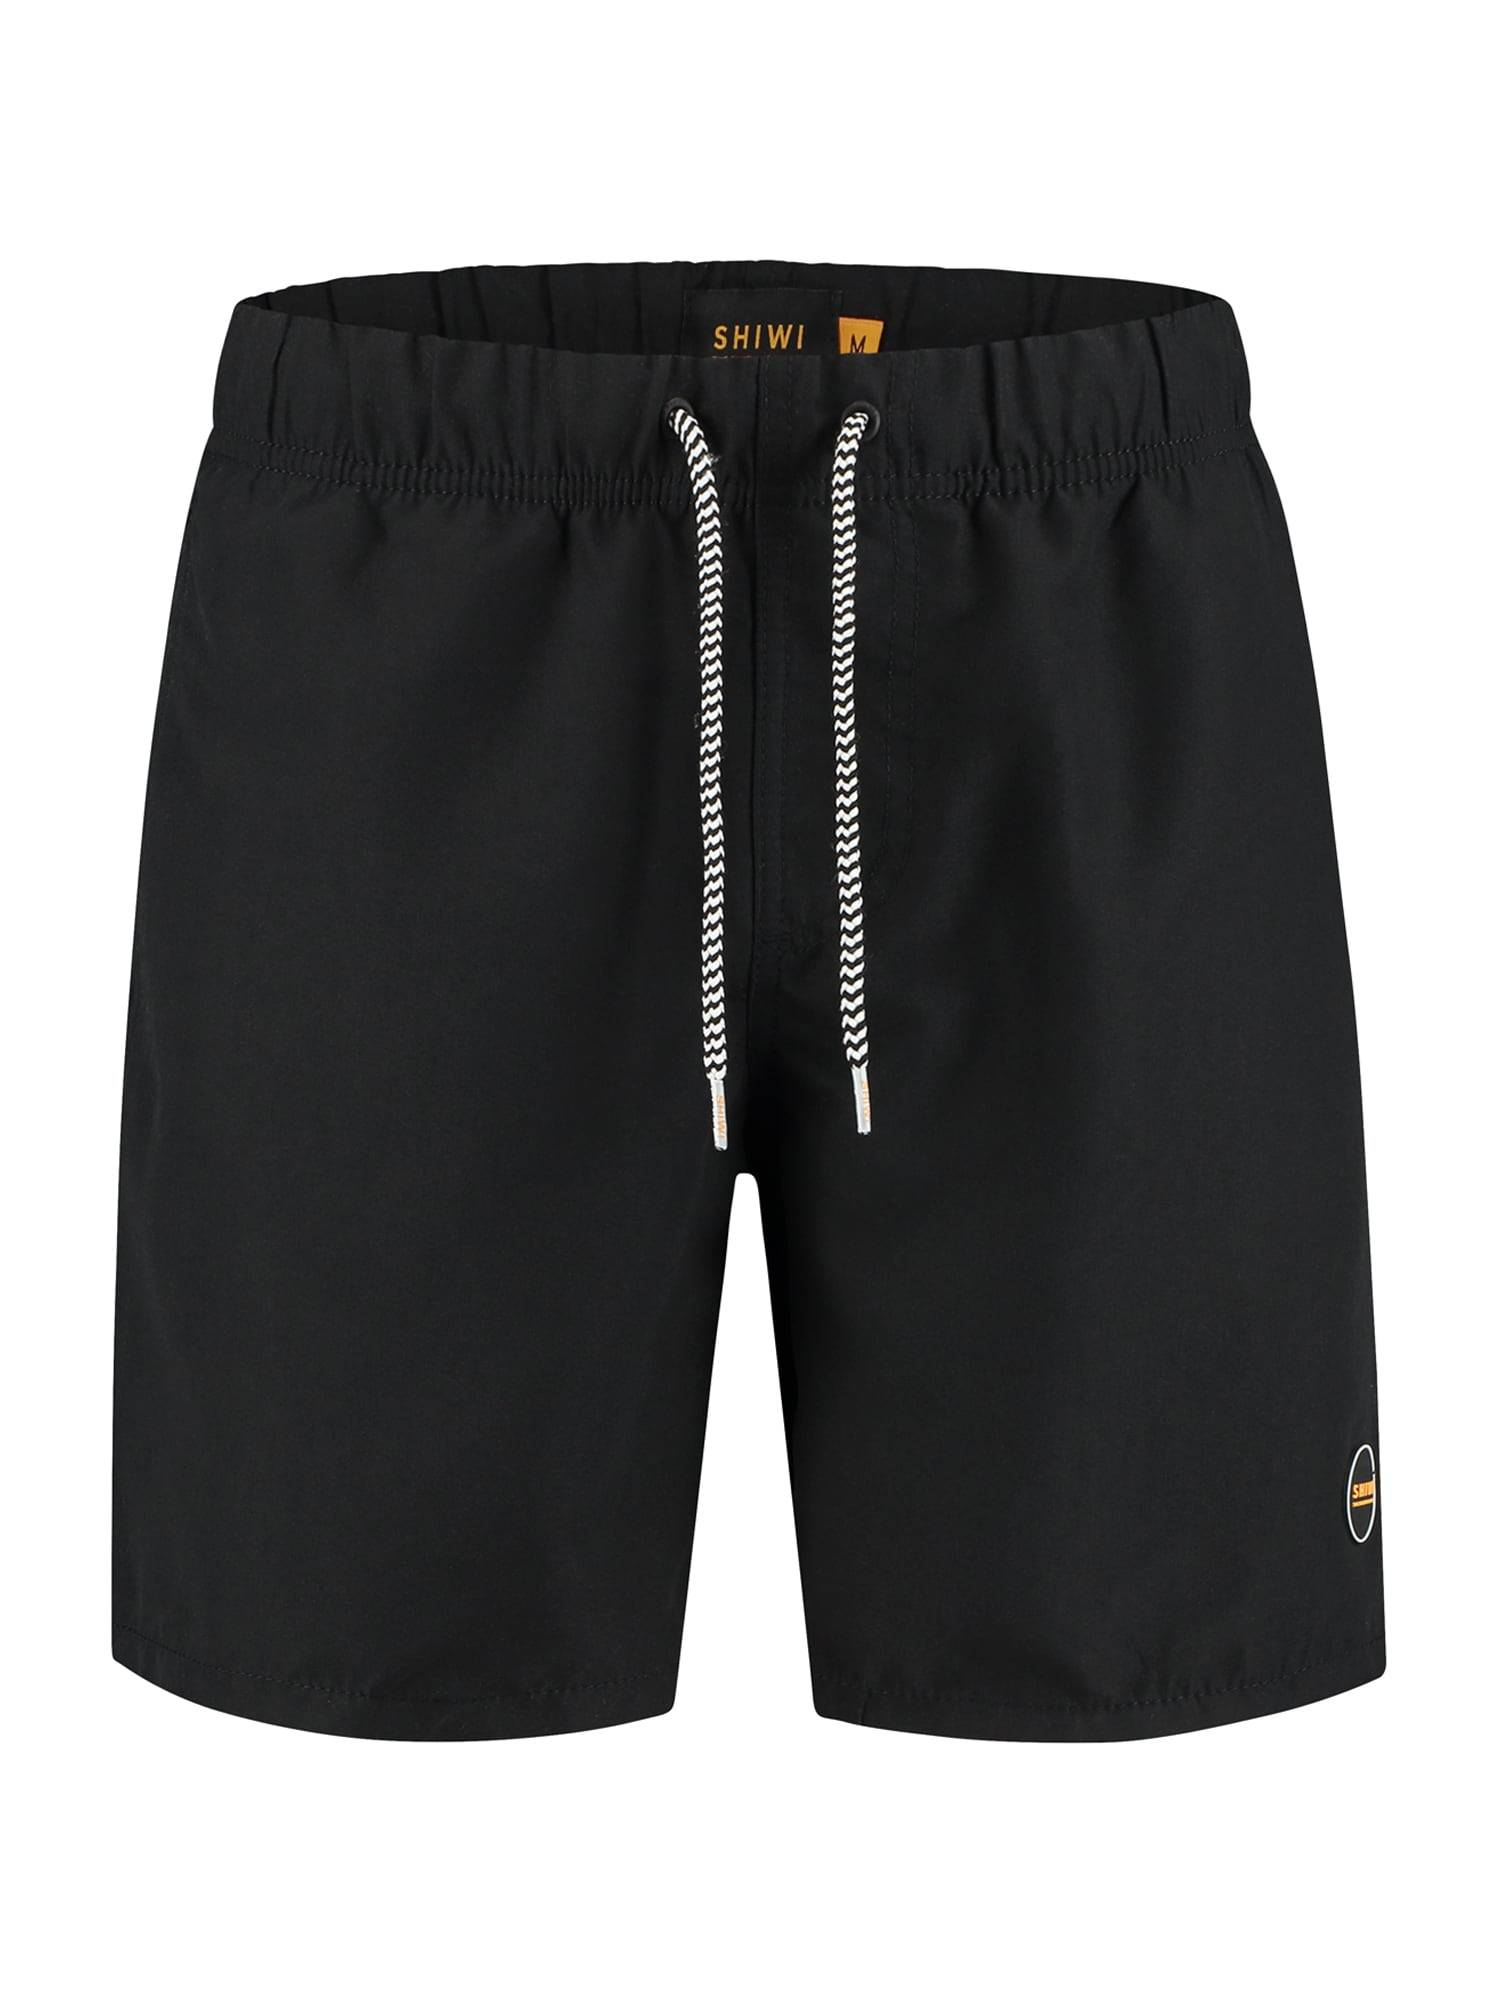 Shiwi Boardshorts  - Noir - Taille: XL - male